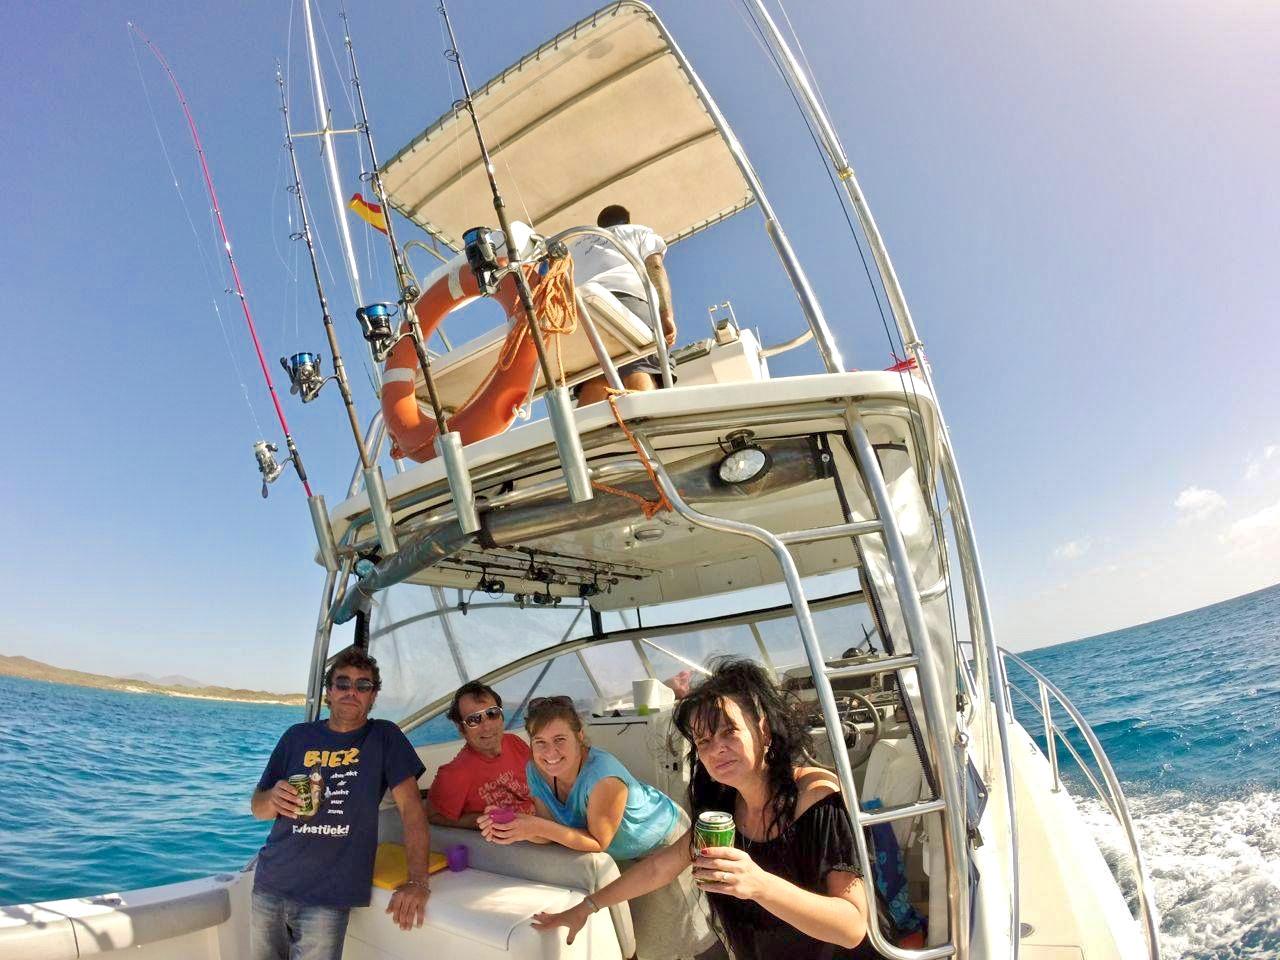 Pesca de alta mar en un barco de pesca deportiva totalmente equipado